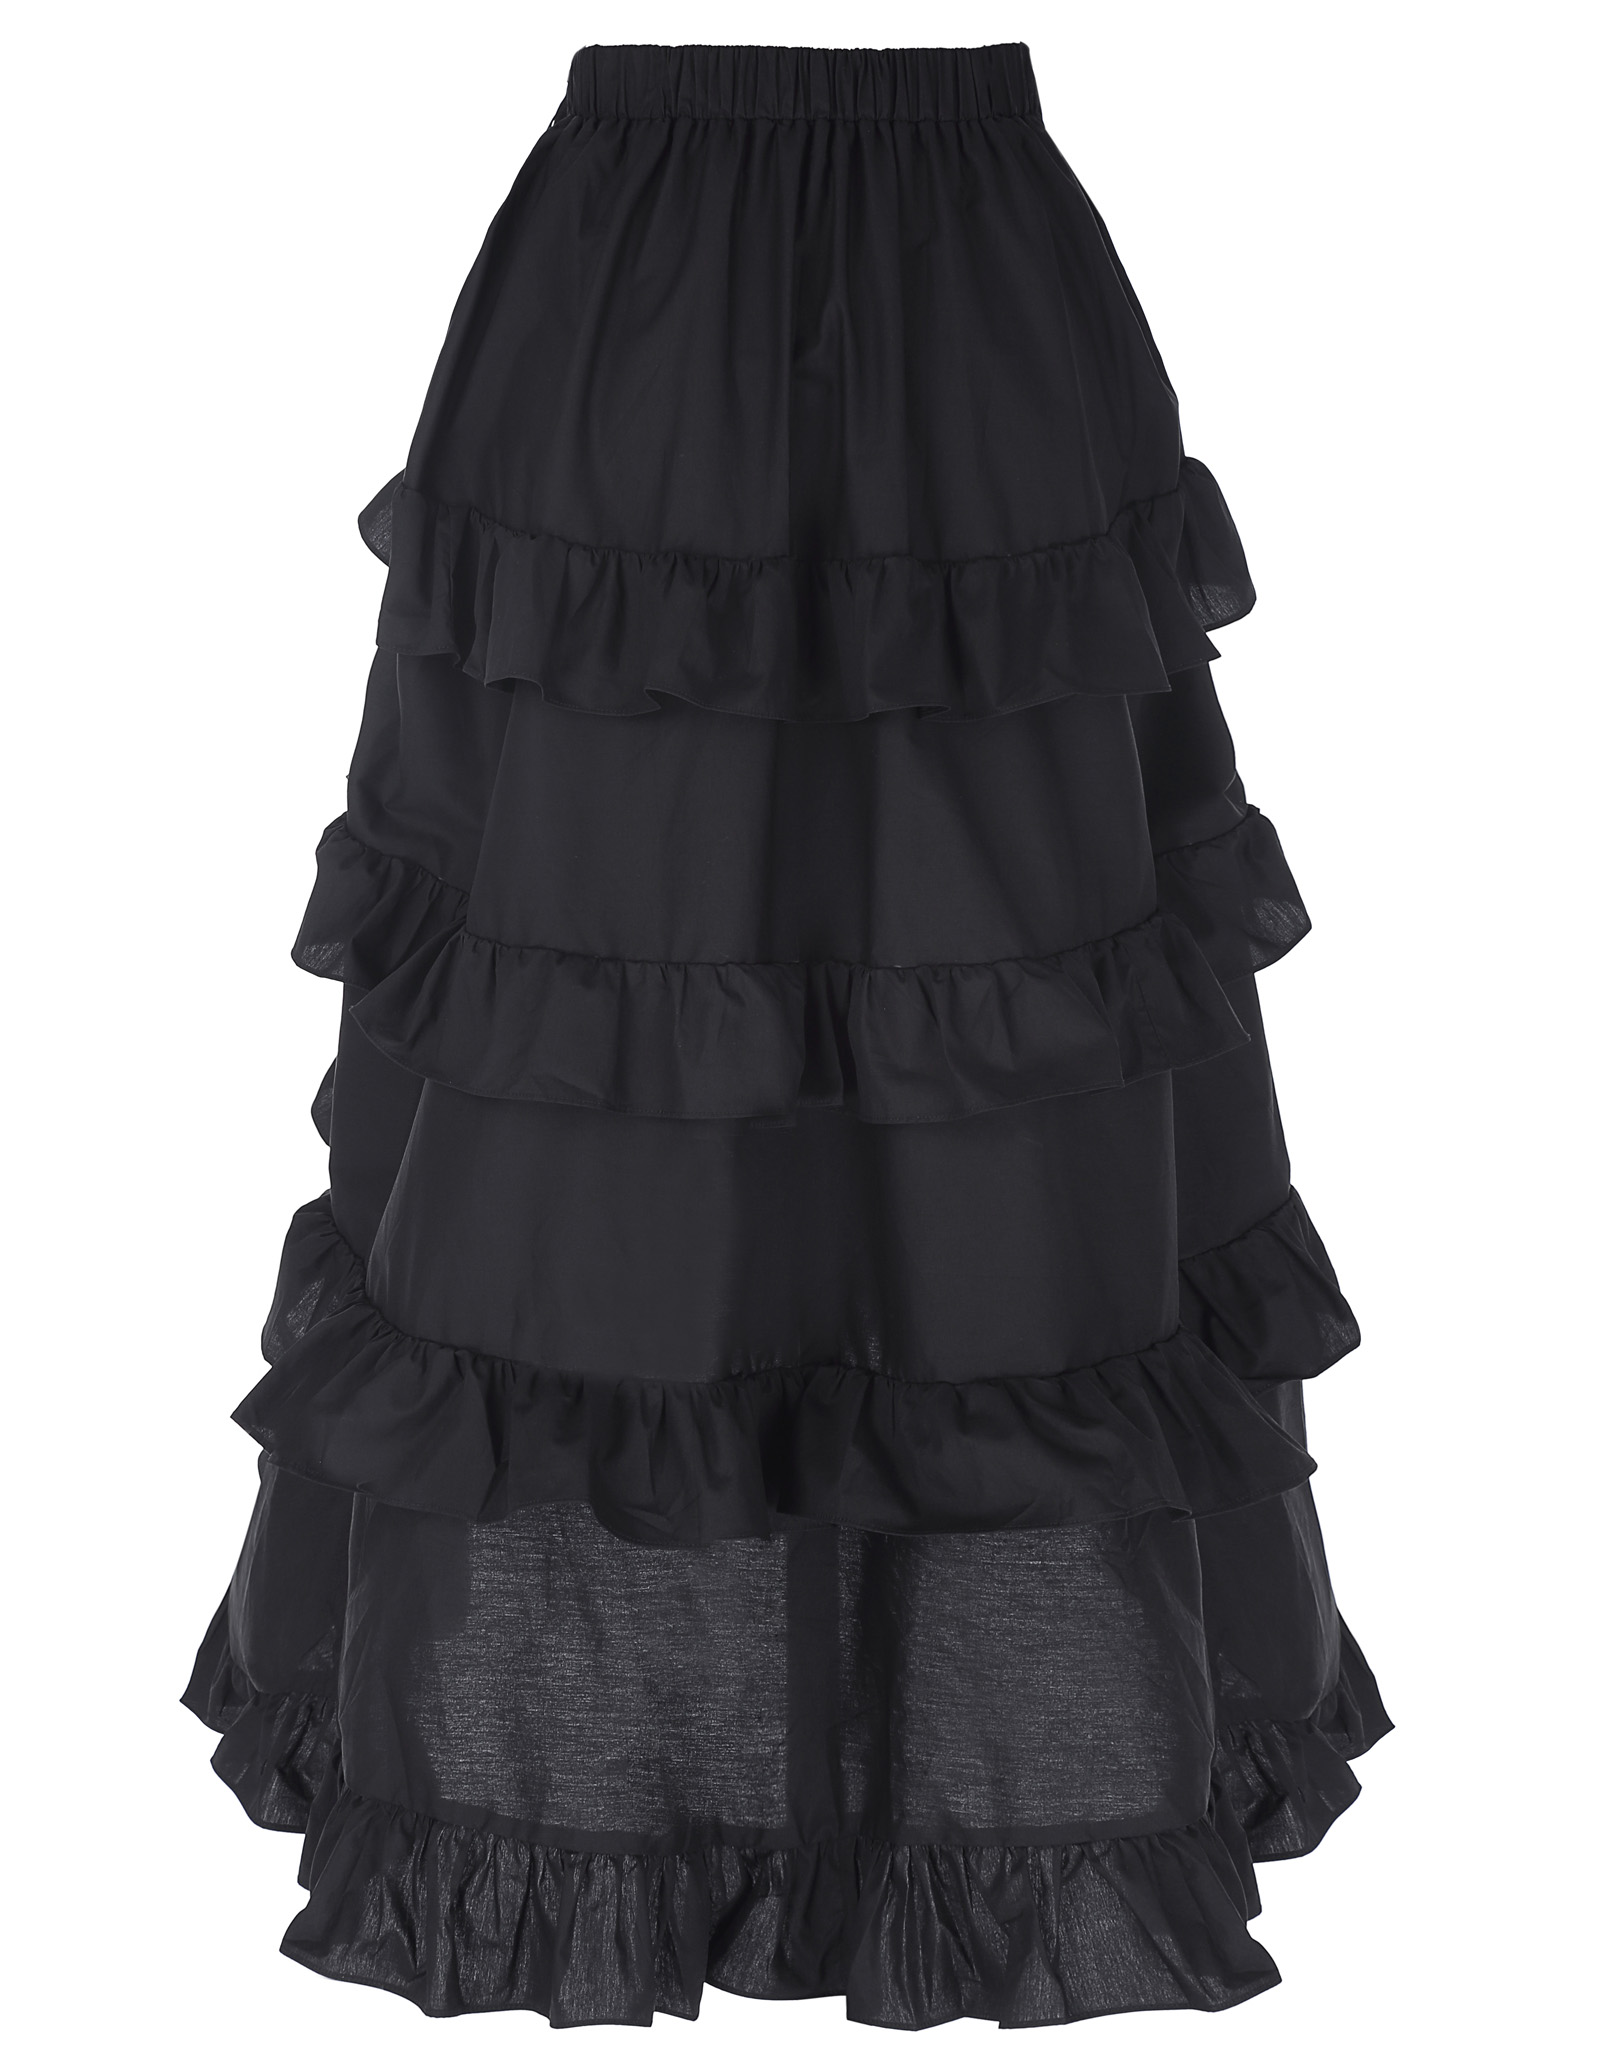 2018 Gothic Style Skirt Women Sexy Fishtail Slim High-Low Asymmetric Ruffle Vintage Steampunk Clothing Cotton Skirts